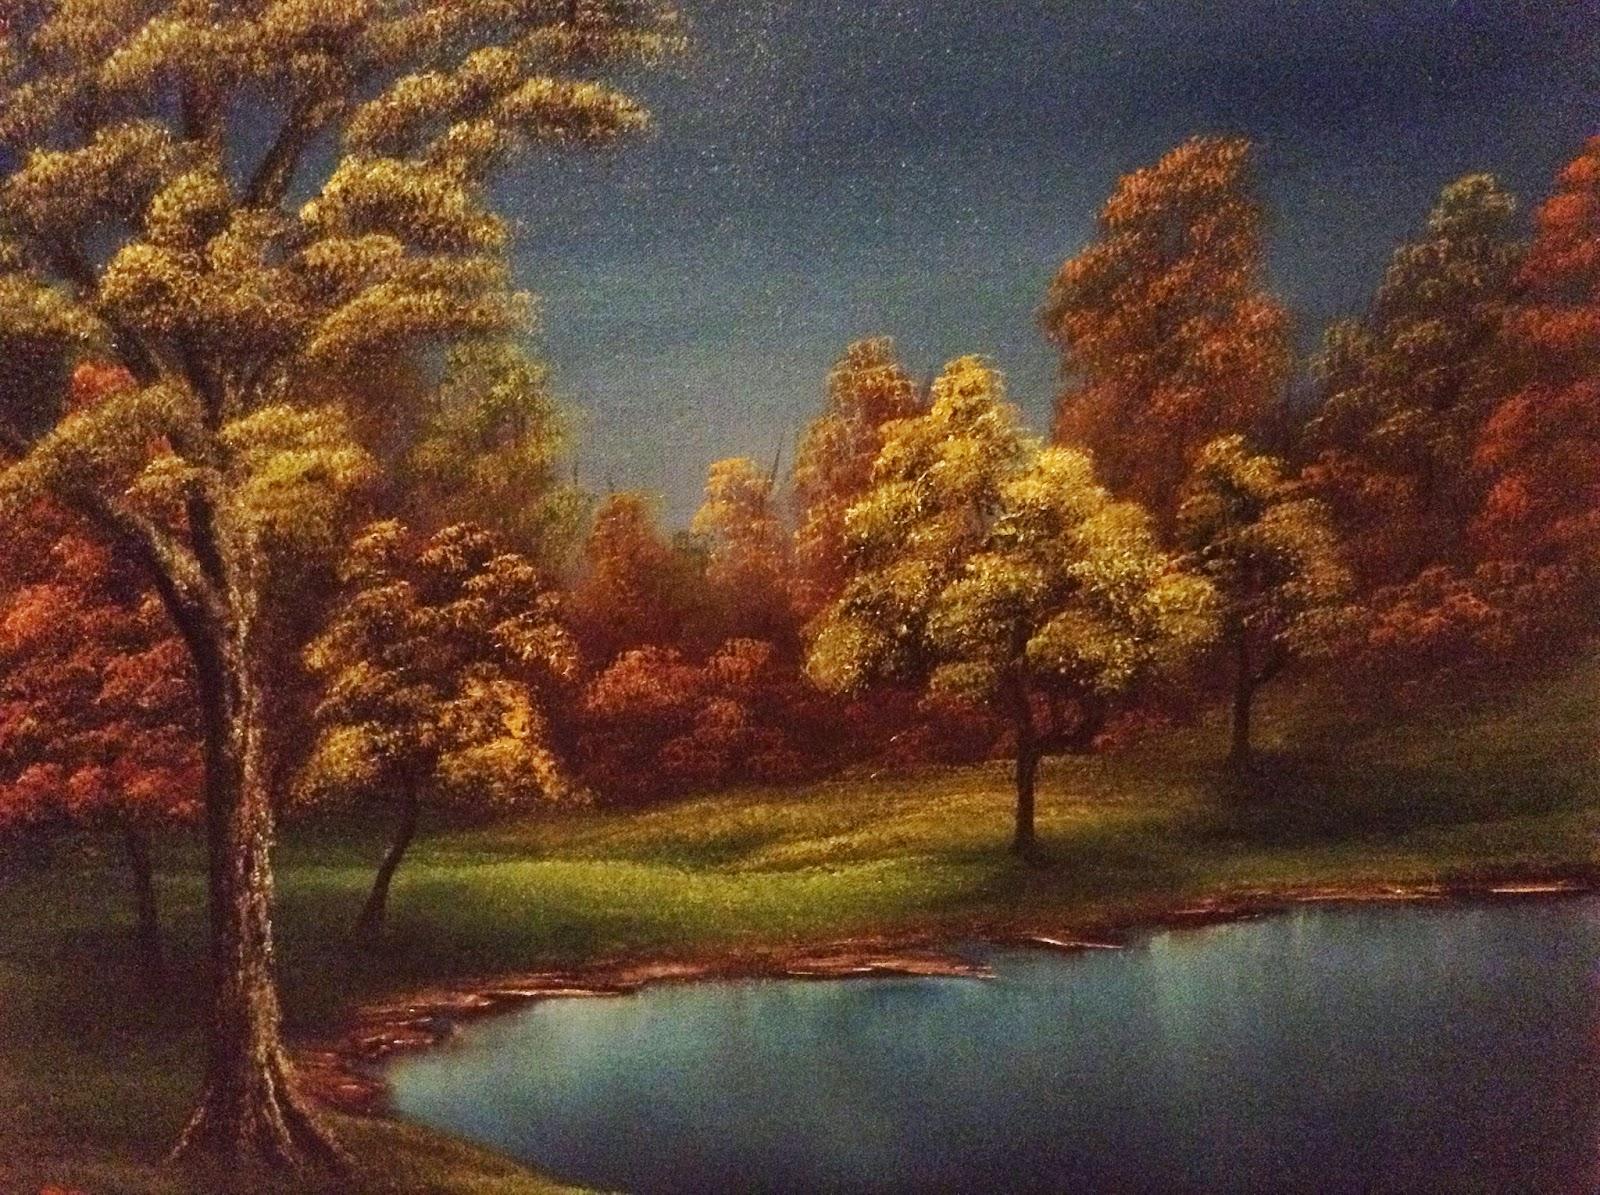 Don BelikBob Ross Painting Classes 1113  2113